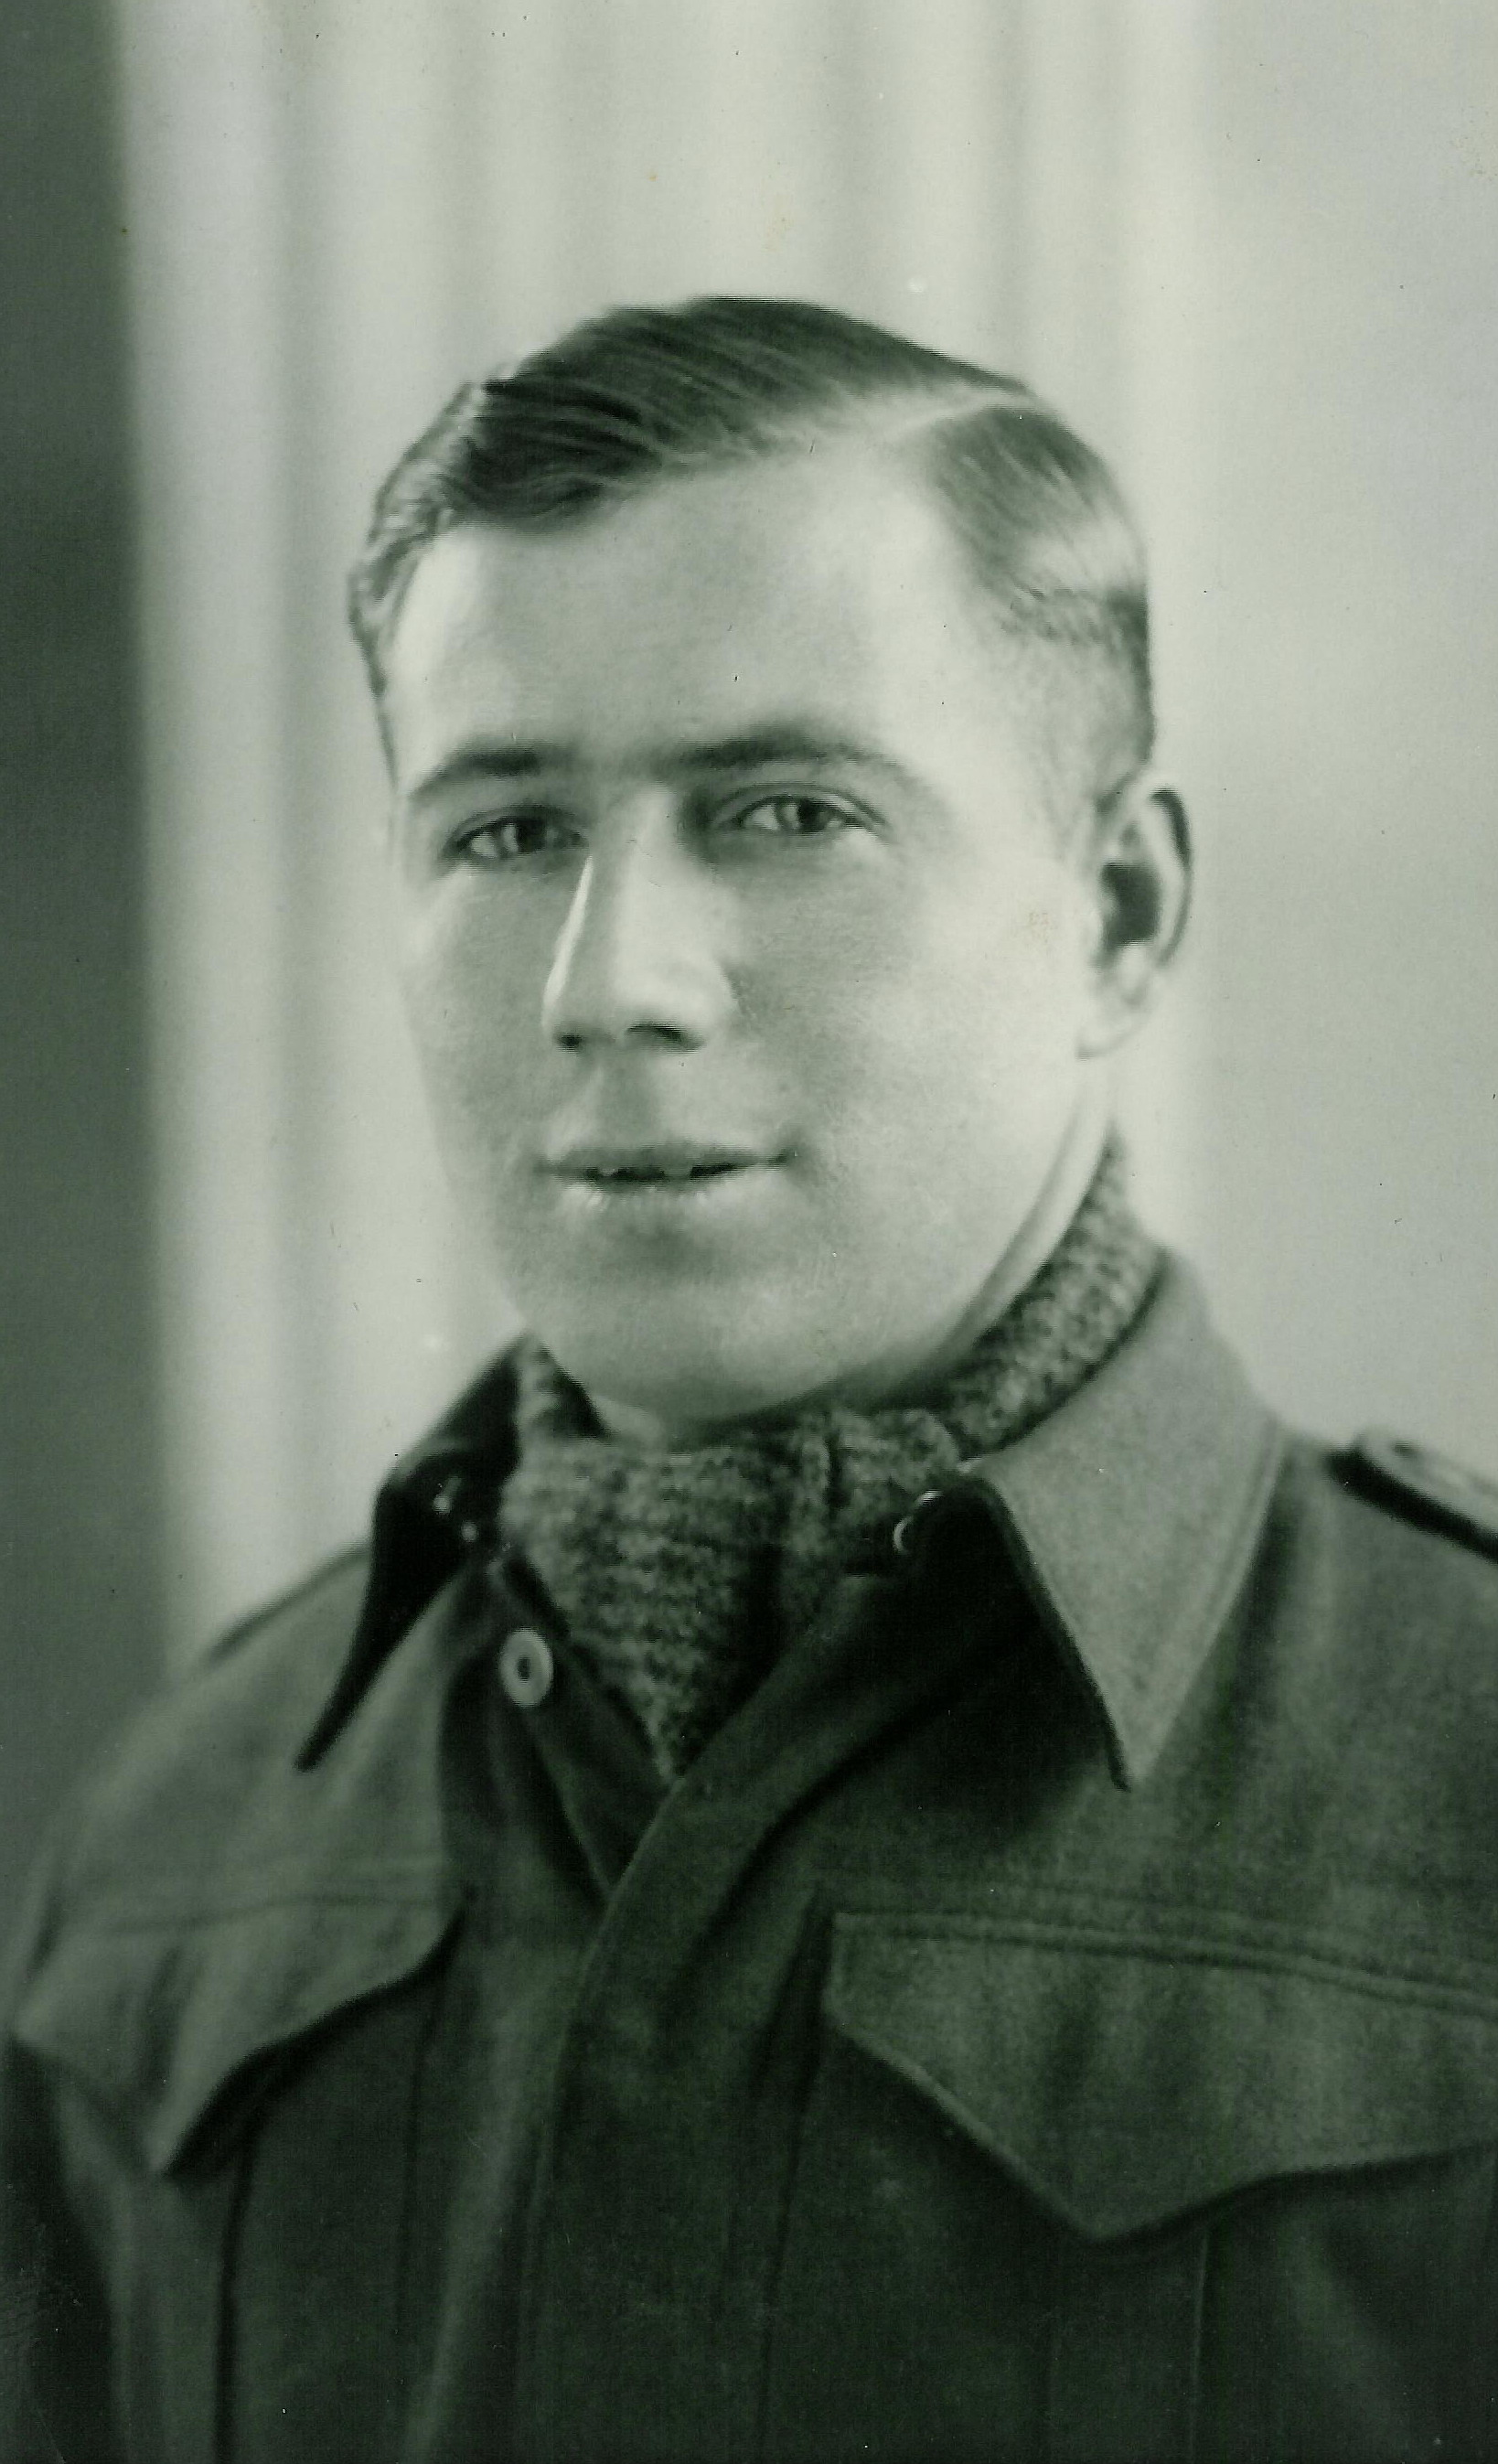 Photo of John (Jack) Edward Seiverwright